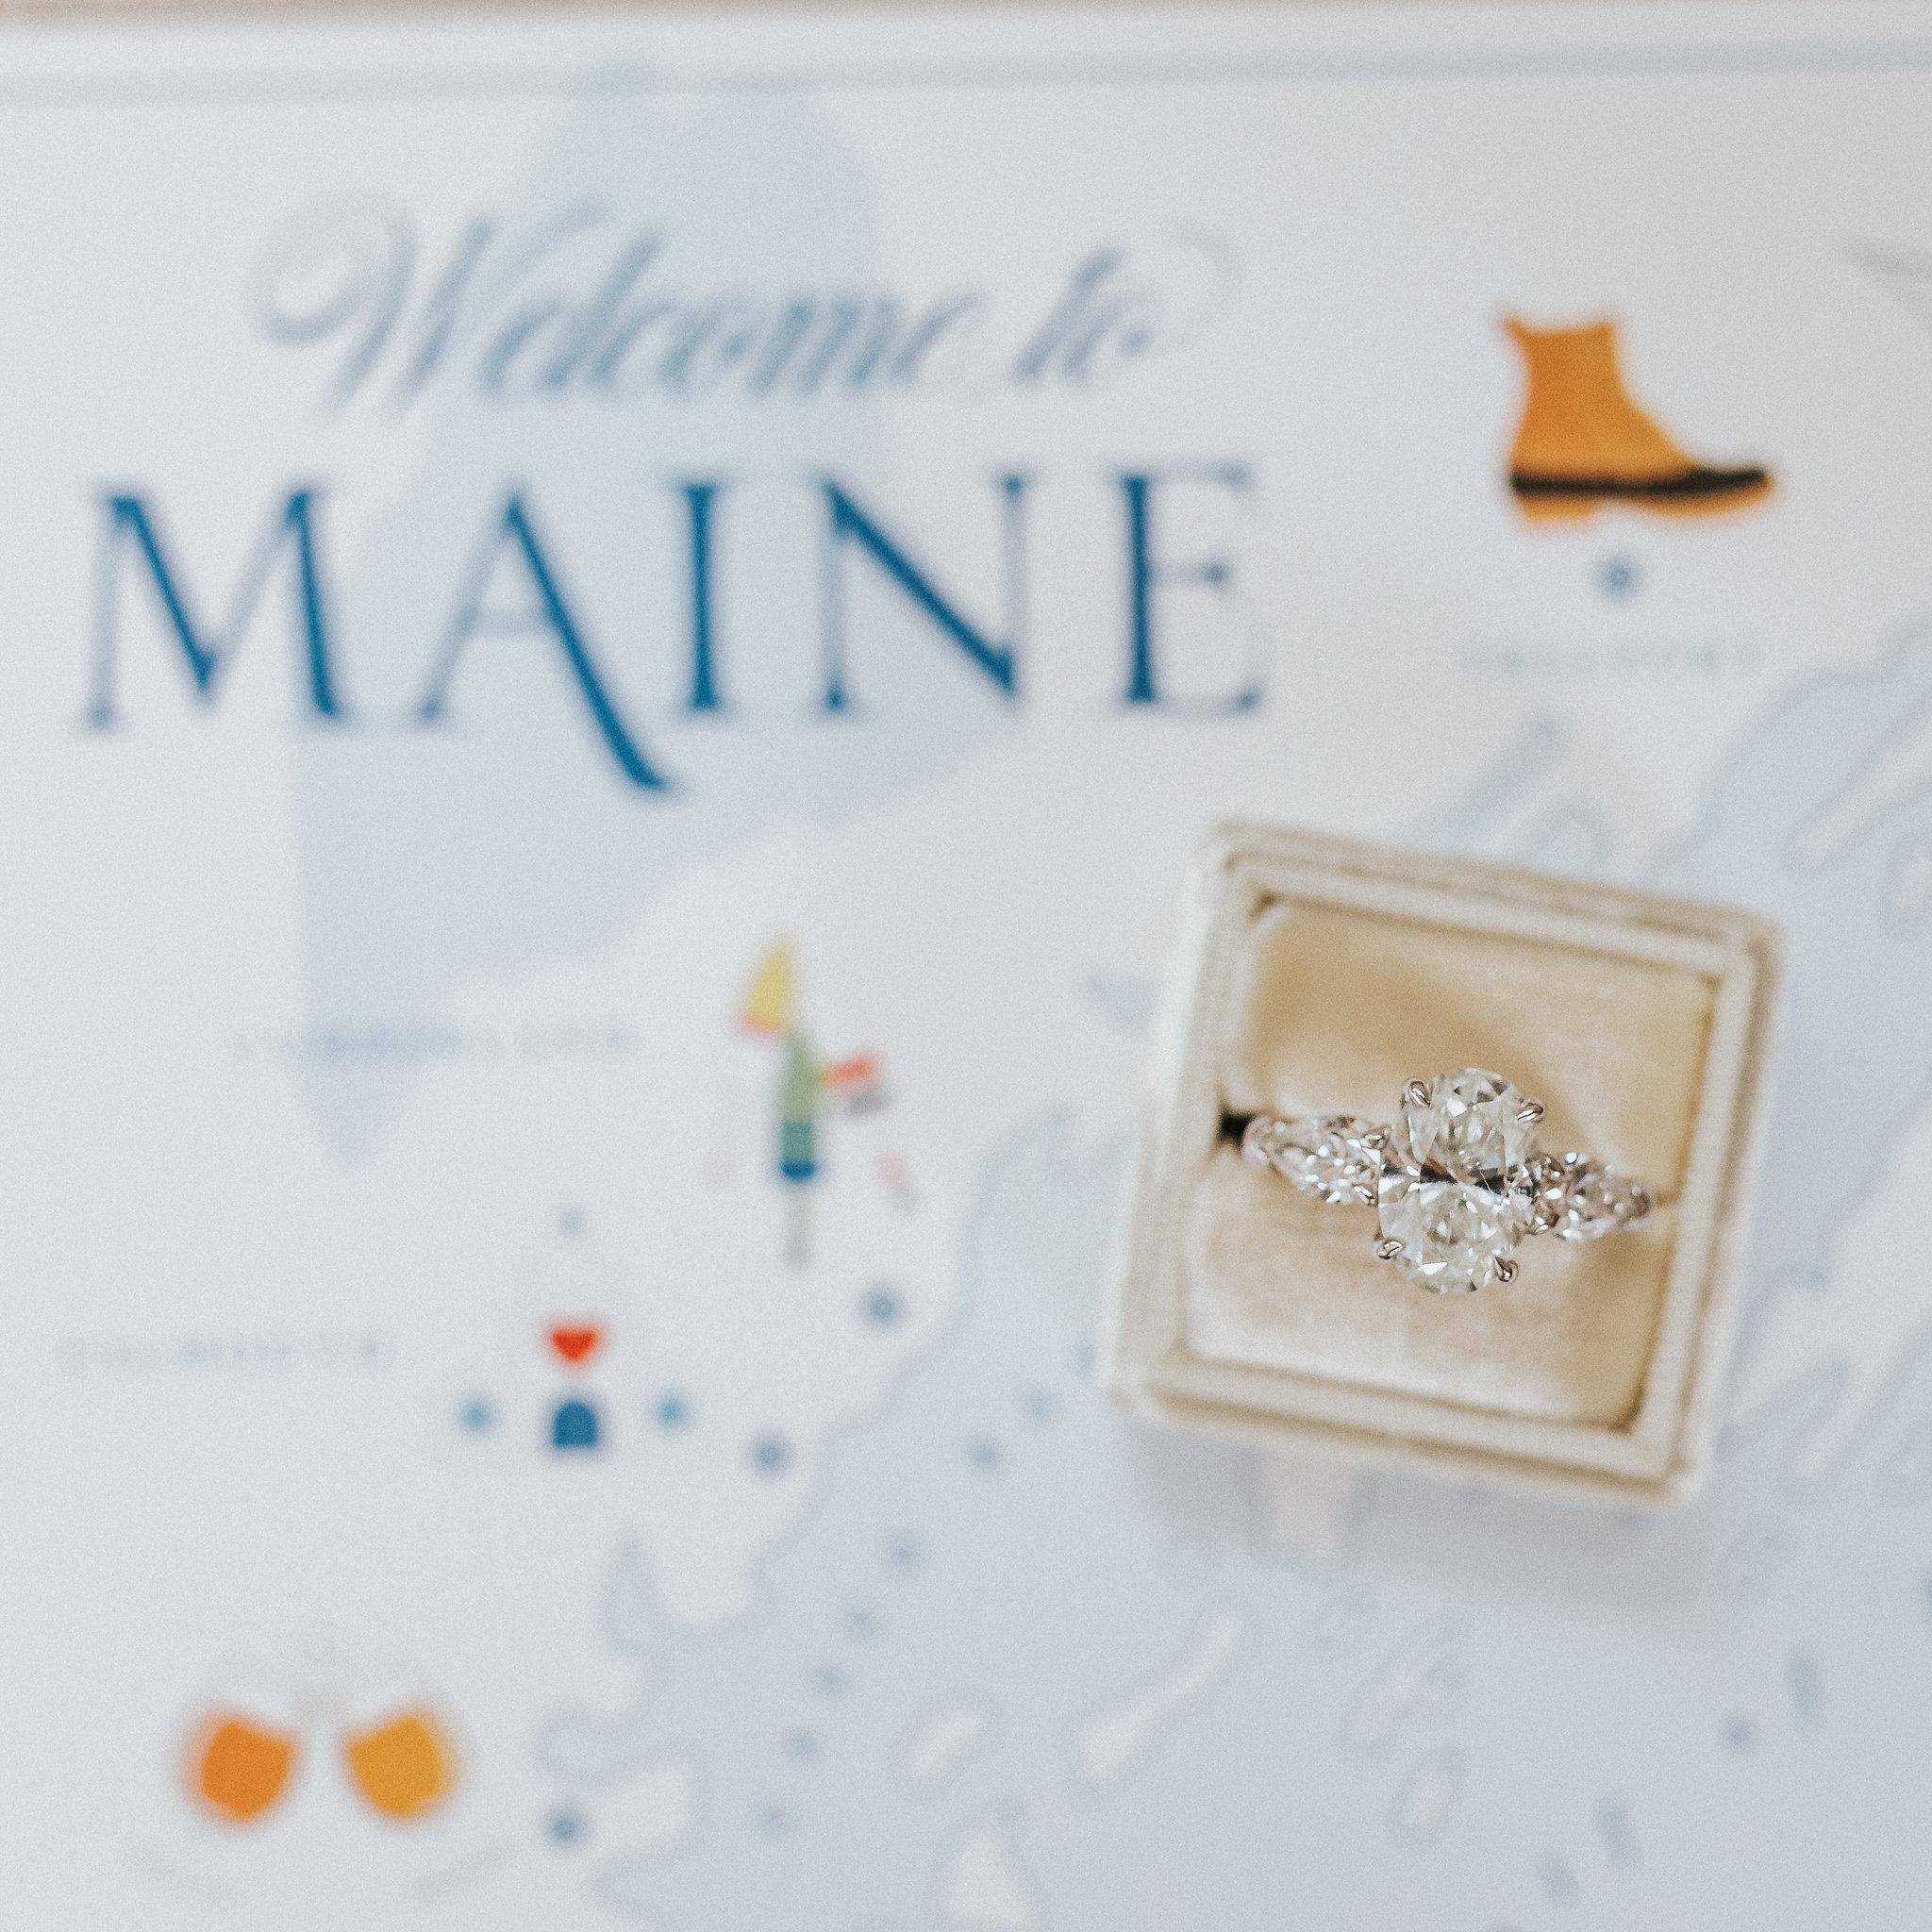 Maine Maritime Wedding_080418_2.jpg